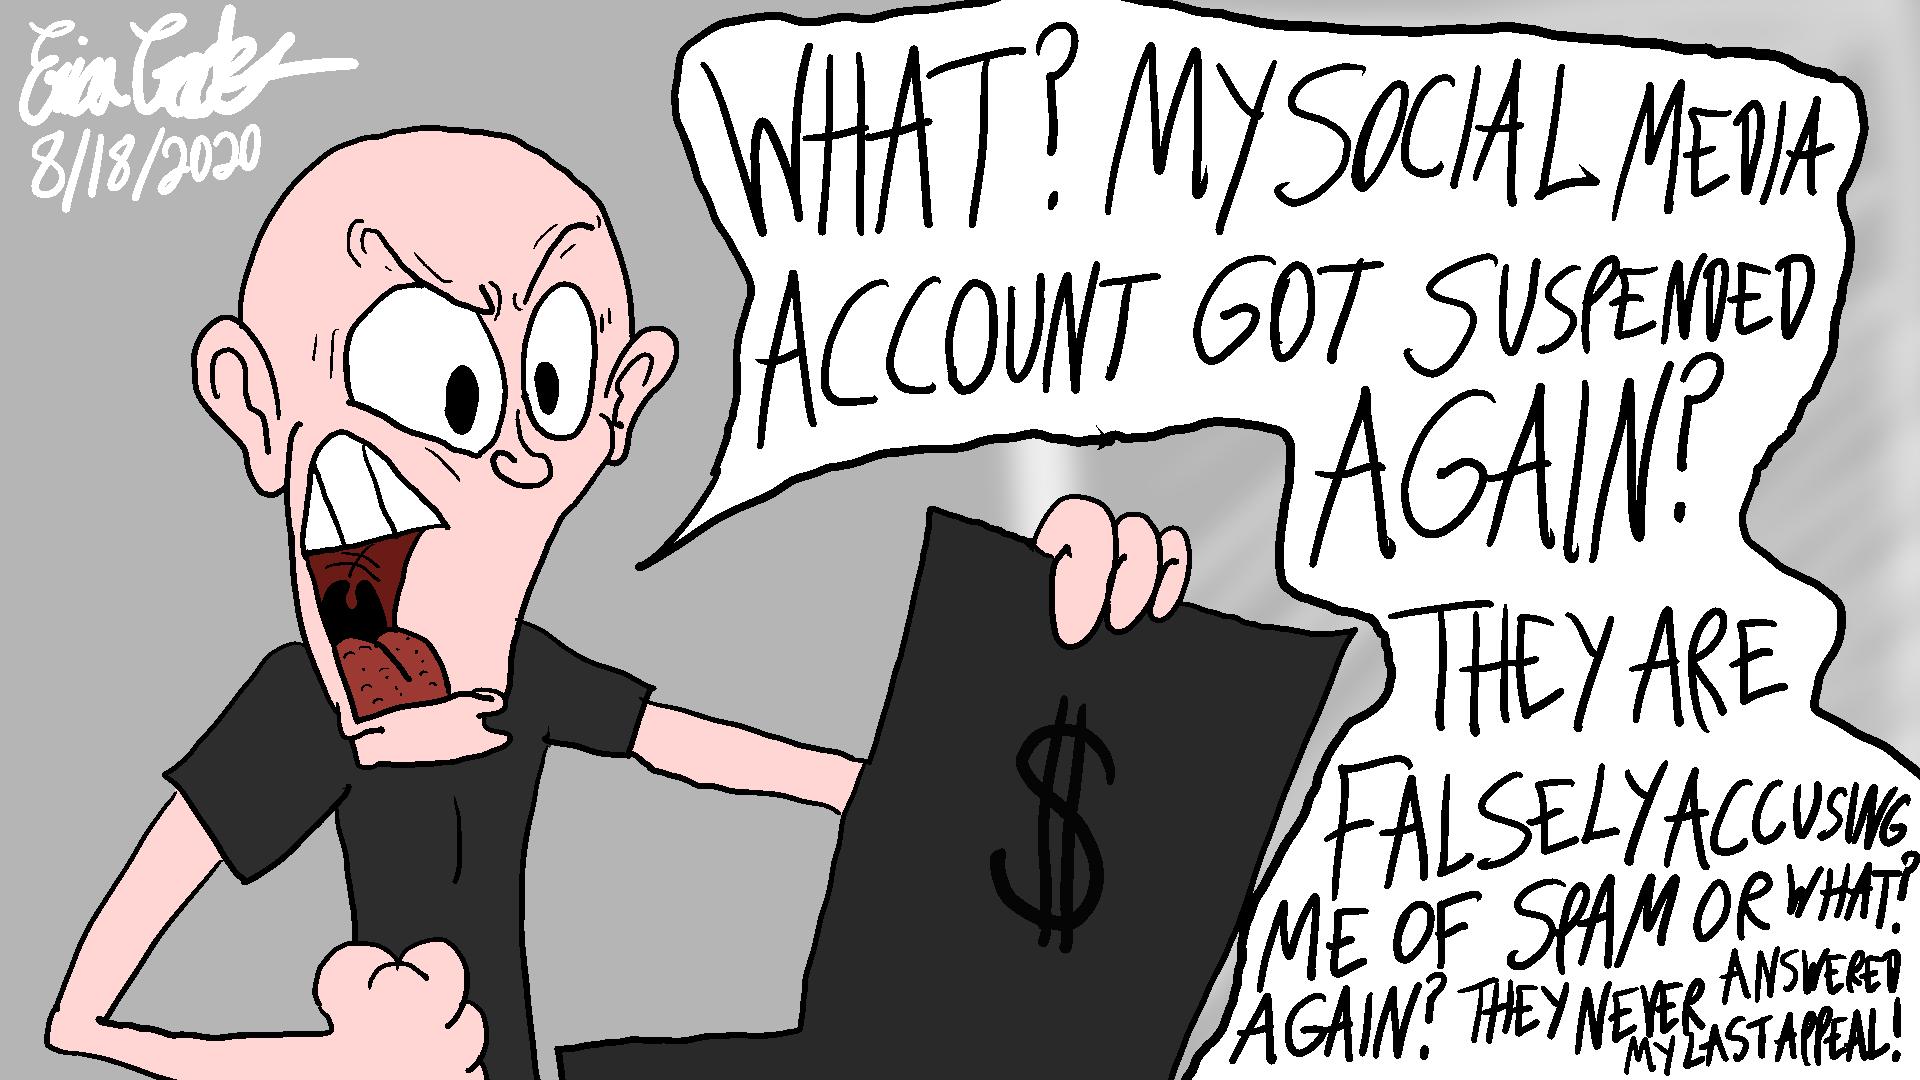 Erica Crooks Comics 2020 : Social Media Struggles